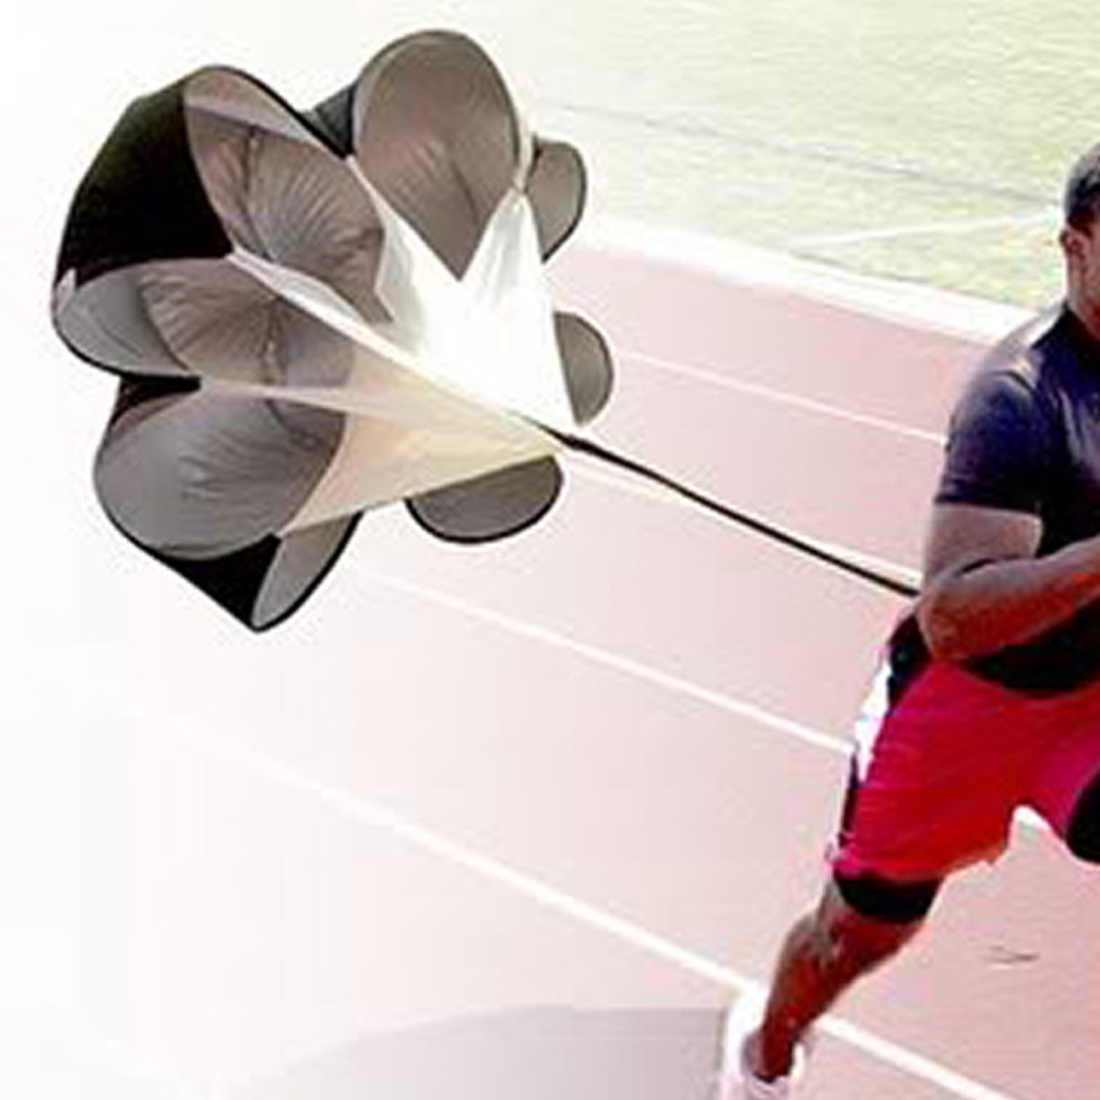 Speed Resistance Training Parachute Running Chute Soccer Football Training Parachute Physical Umbrella Black